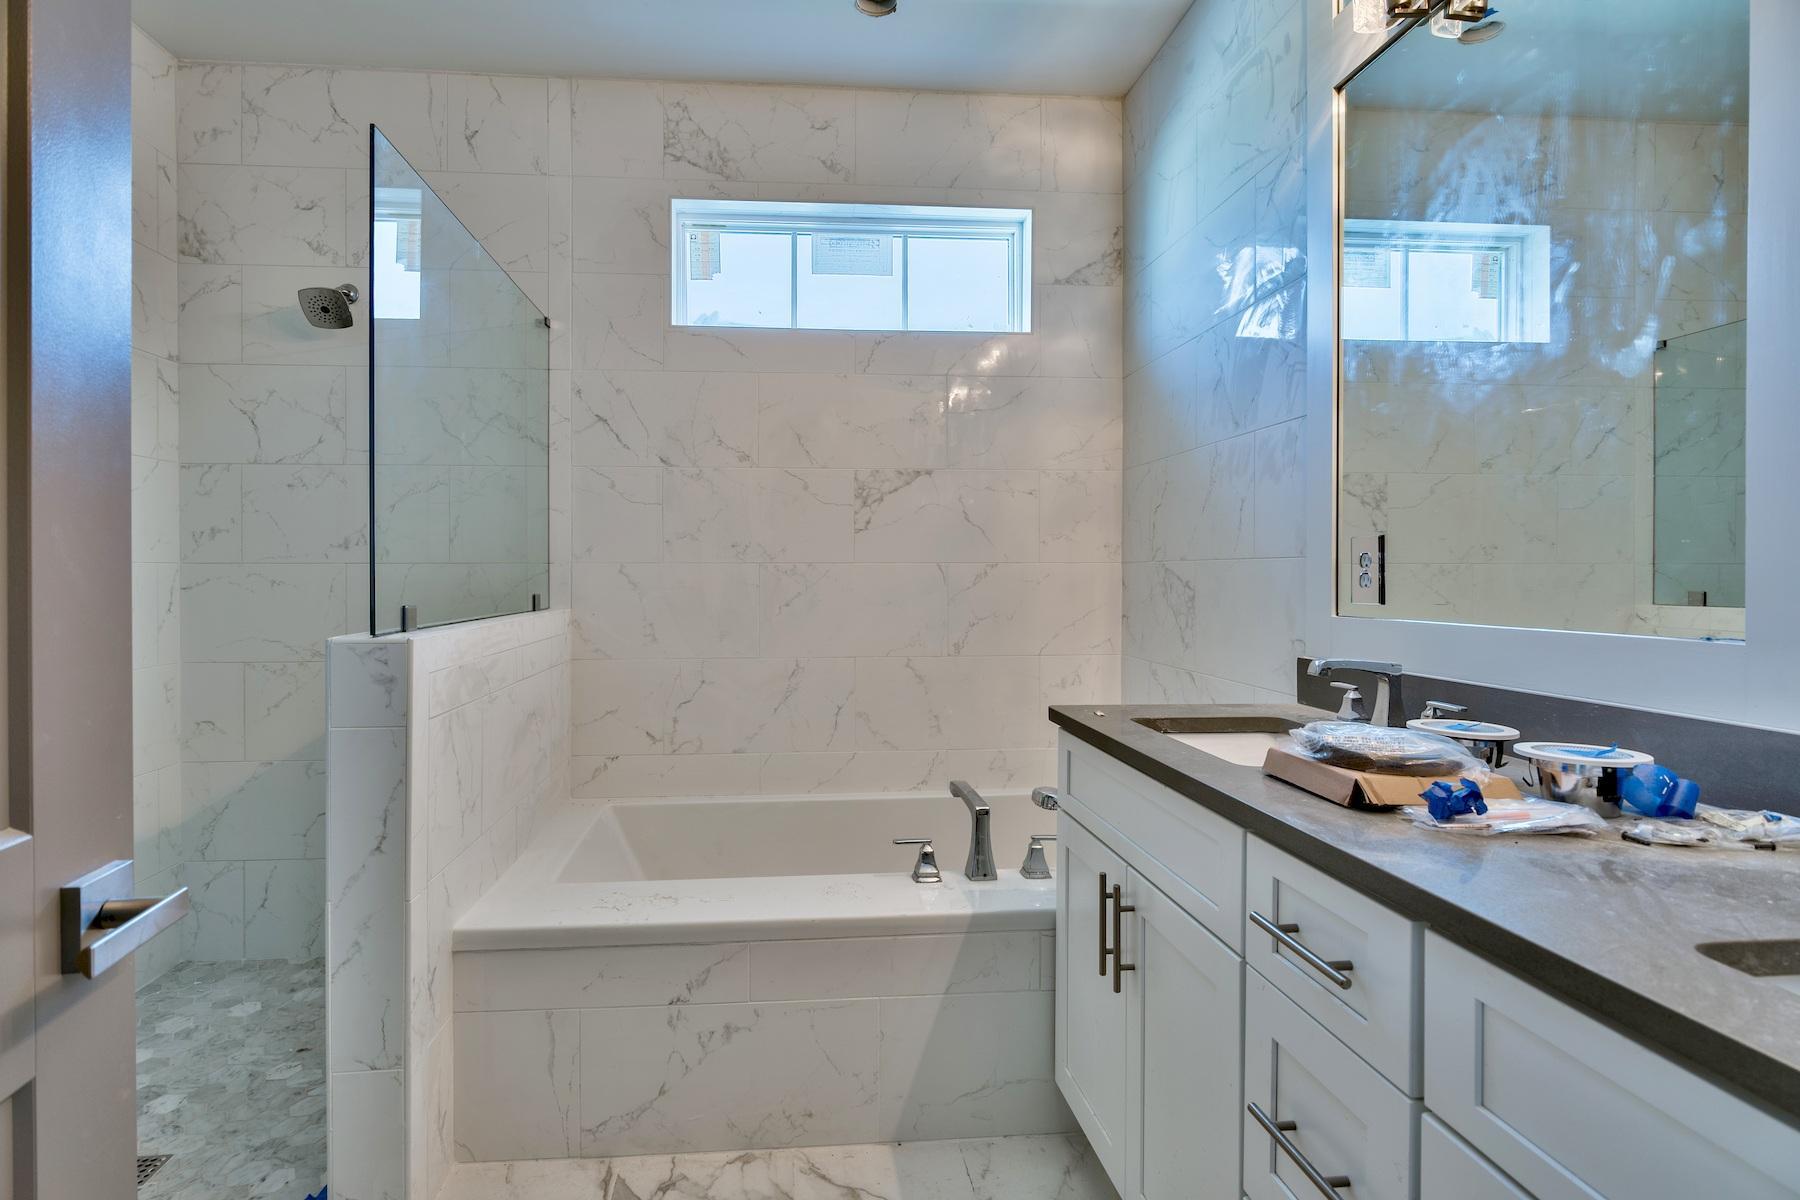 1230 Allen Loop,Santa Rosa Beach,Florida 32459,7 Bedrooms Bedrooms,7 BathroomsBathrooms,Detached single family,Allen Loop,20131126143817002353000000